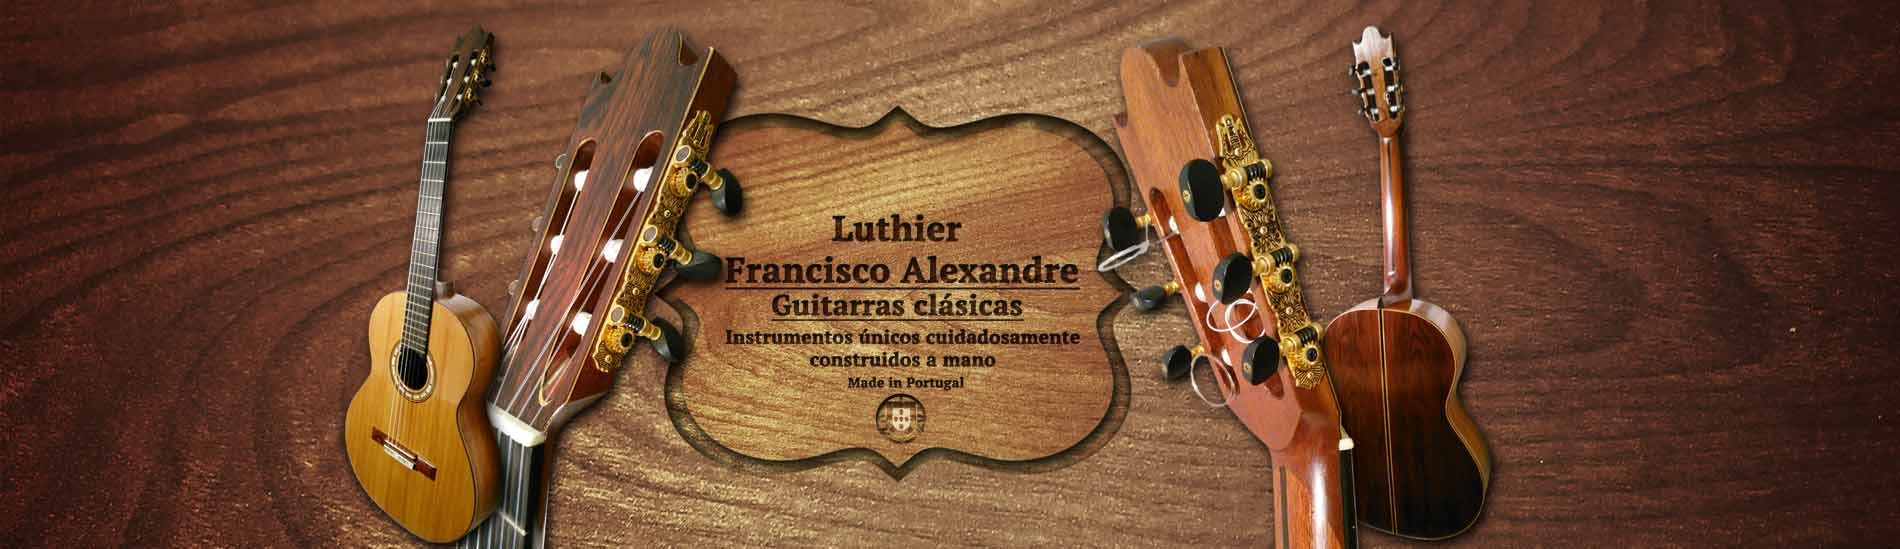 Guitarra Luthier Francisco Alexandre